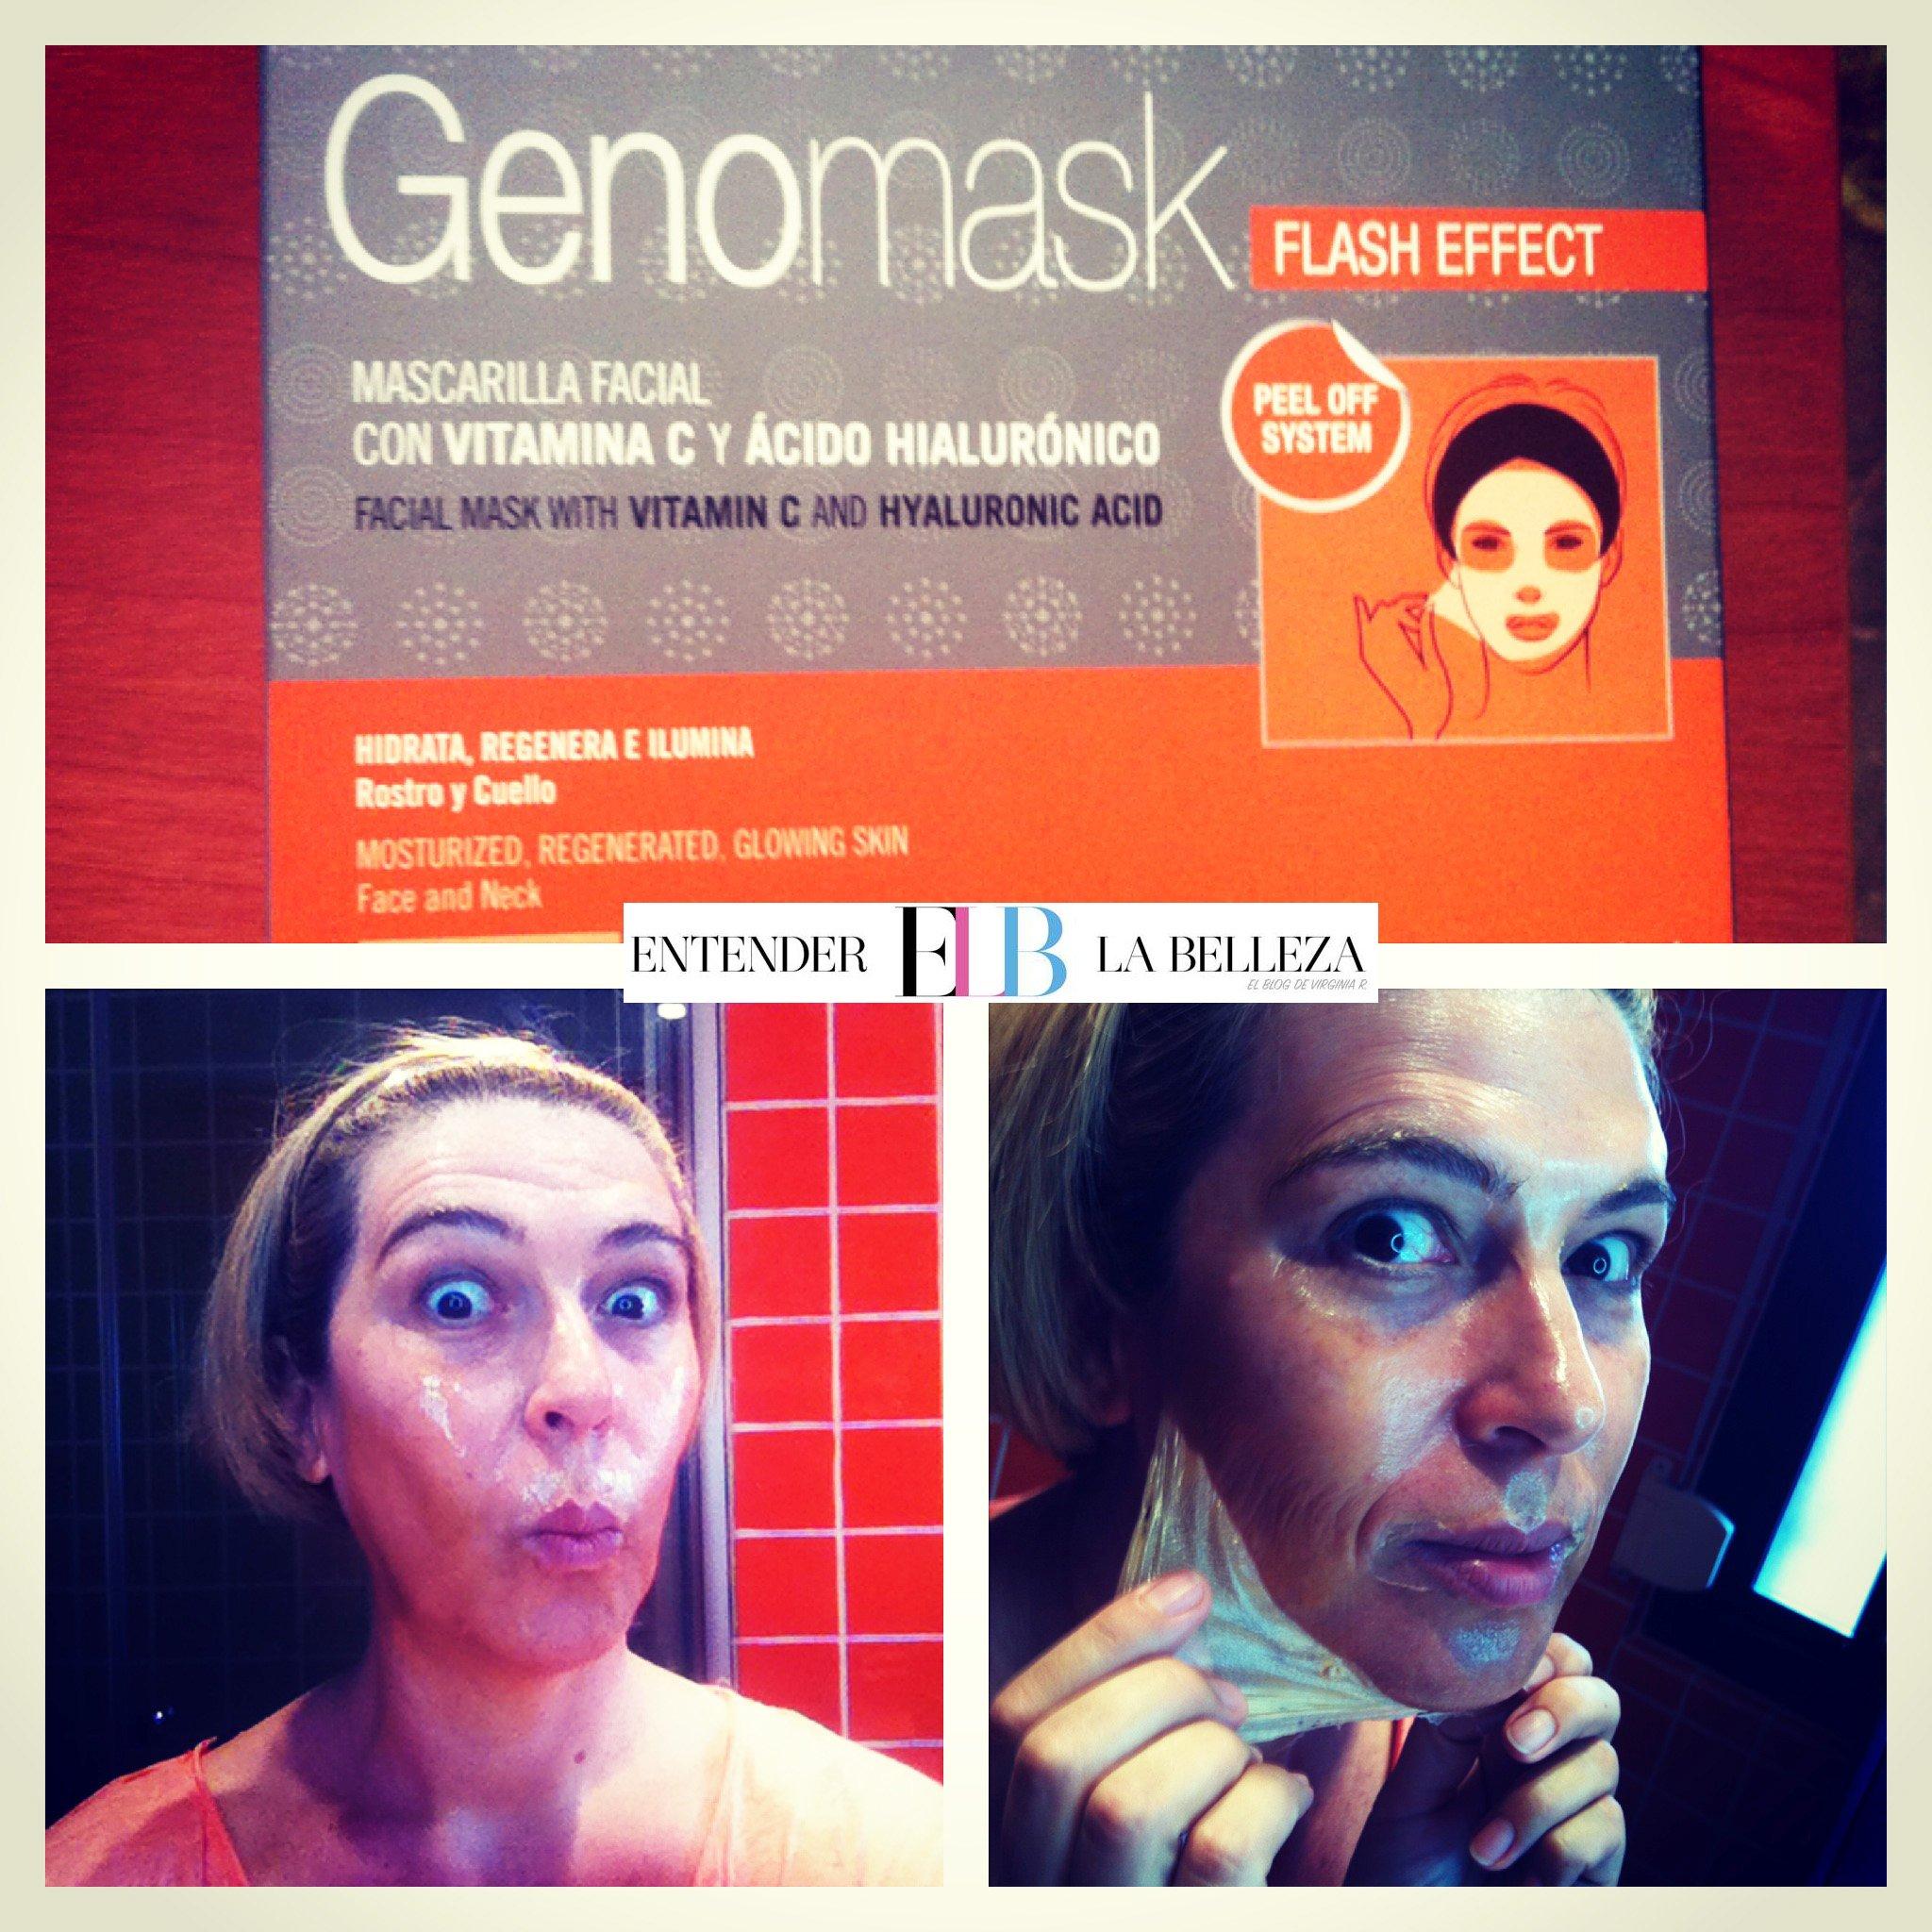 Genomask